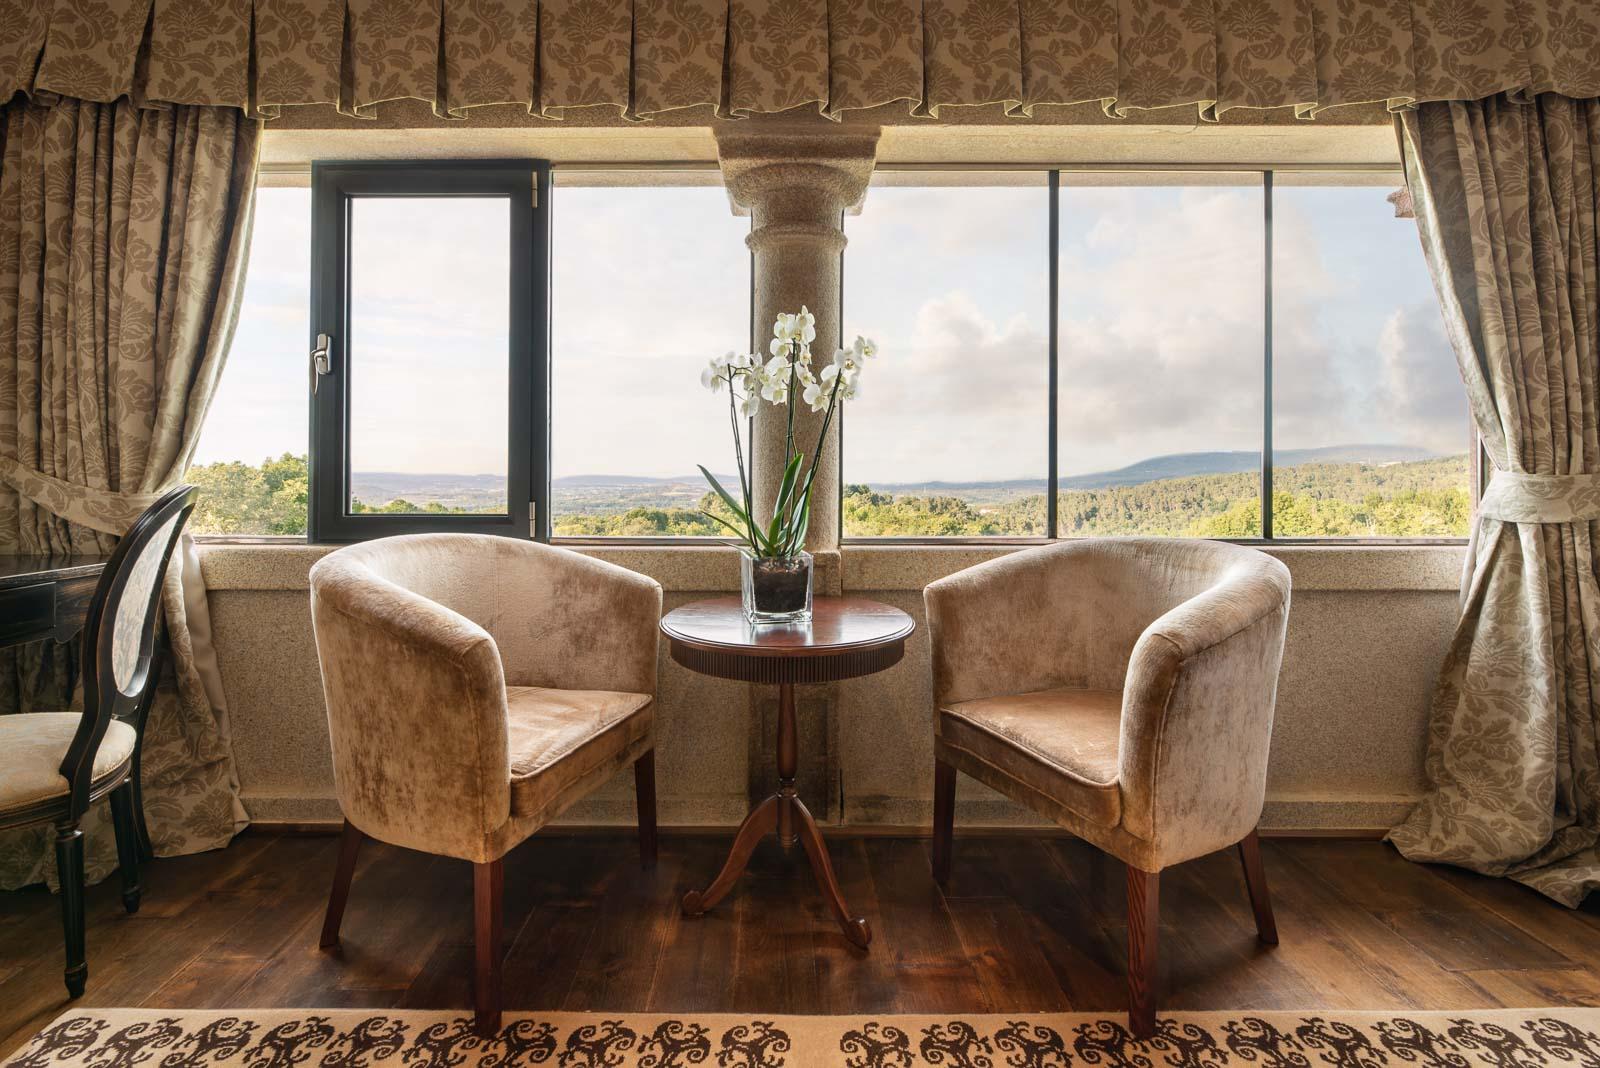 sillones junto a ventana